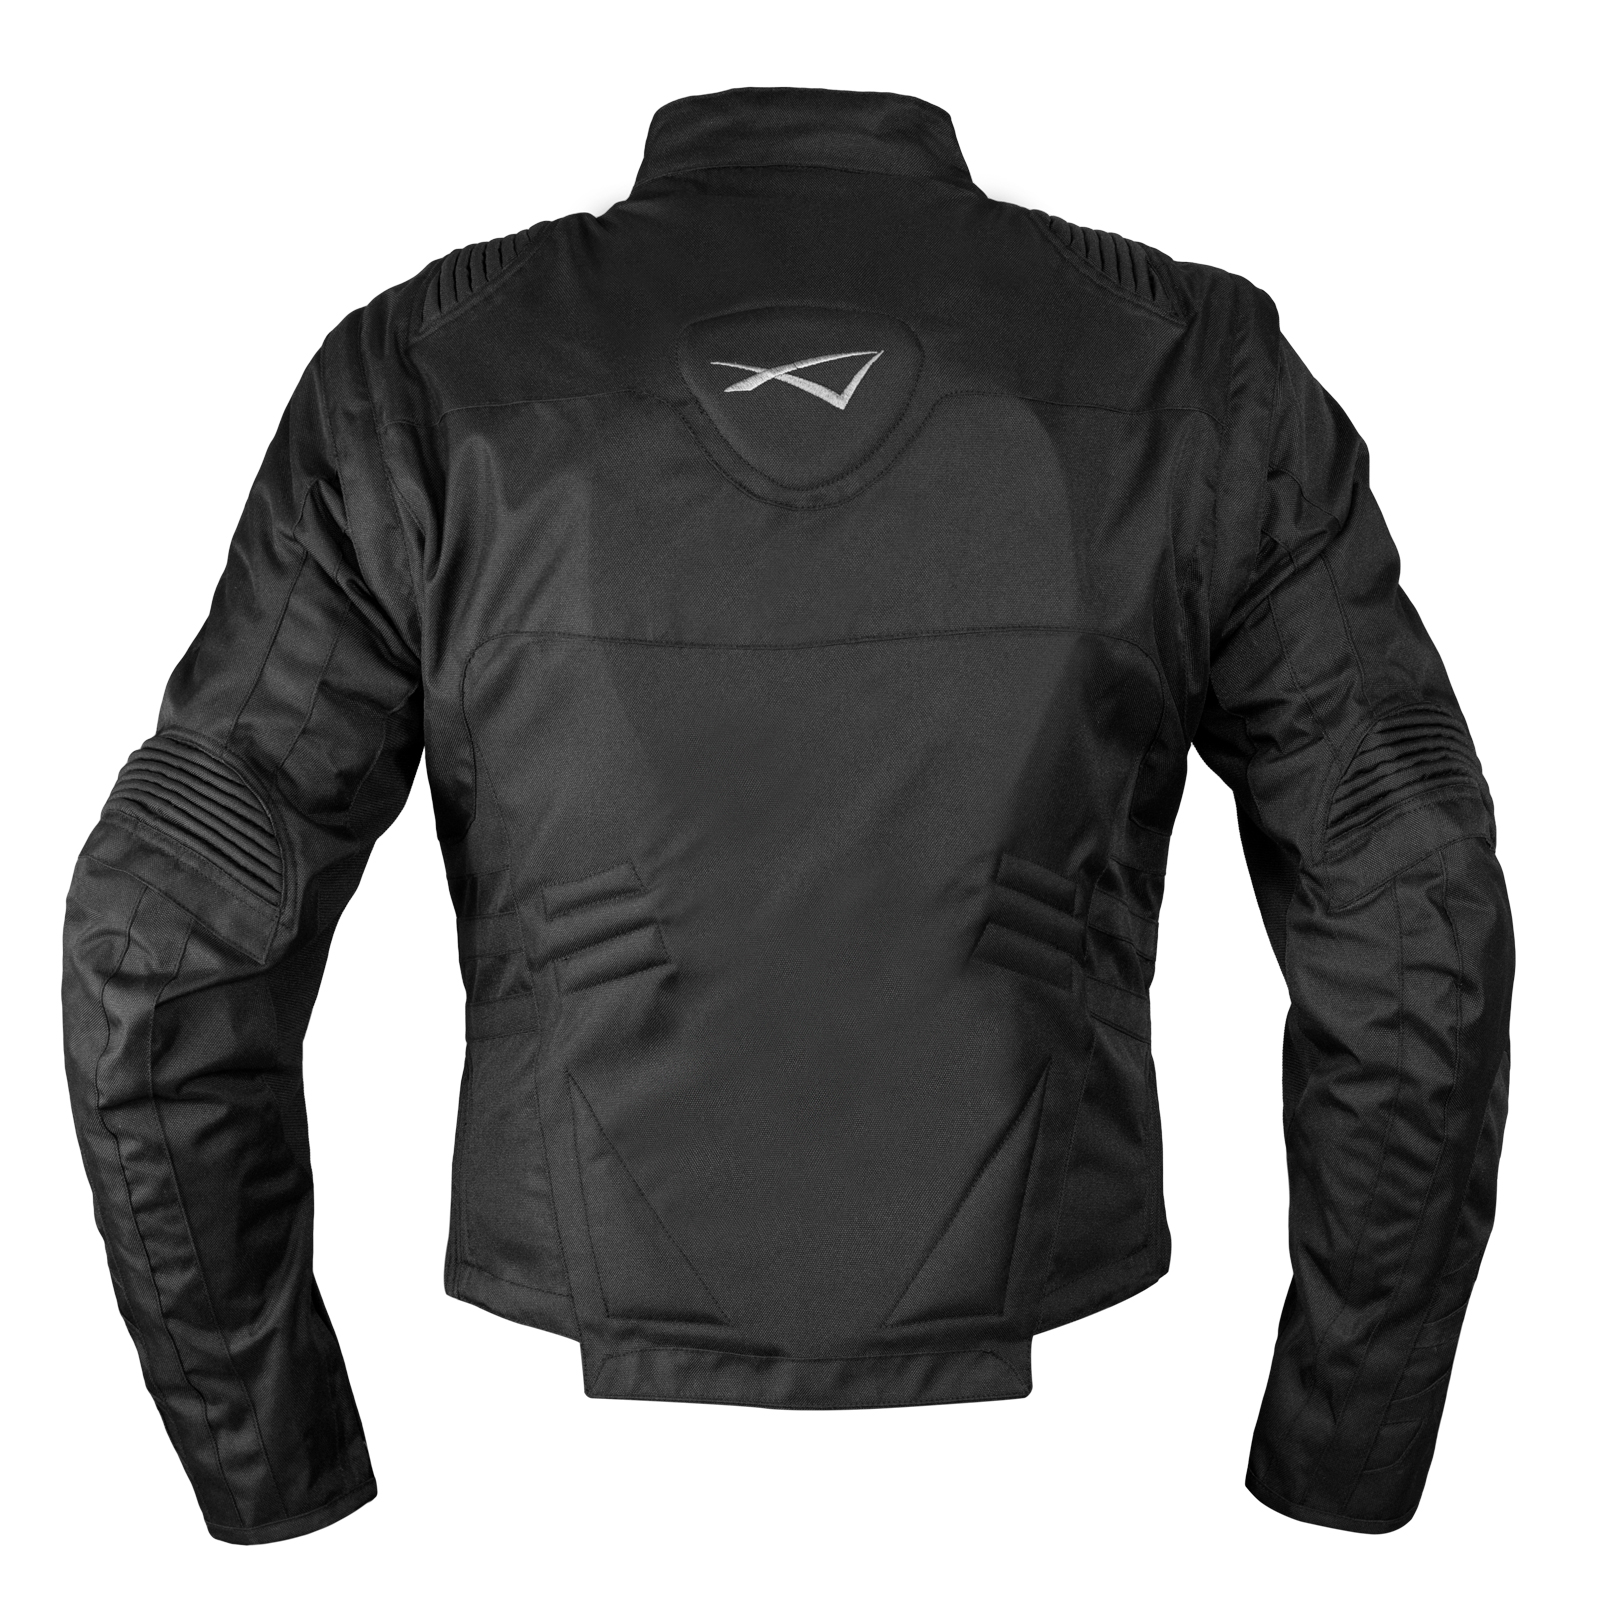 Blouson-Tissu-Haute-Resistance-Protections-Motard-Moto-Touring-Ete miniature 10